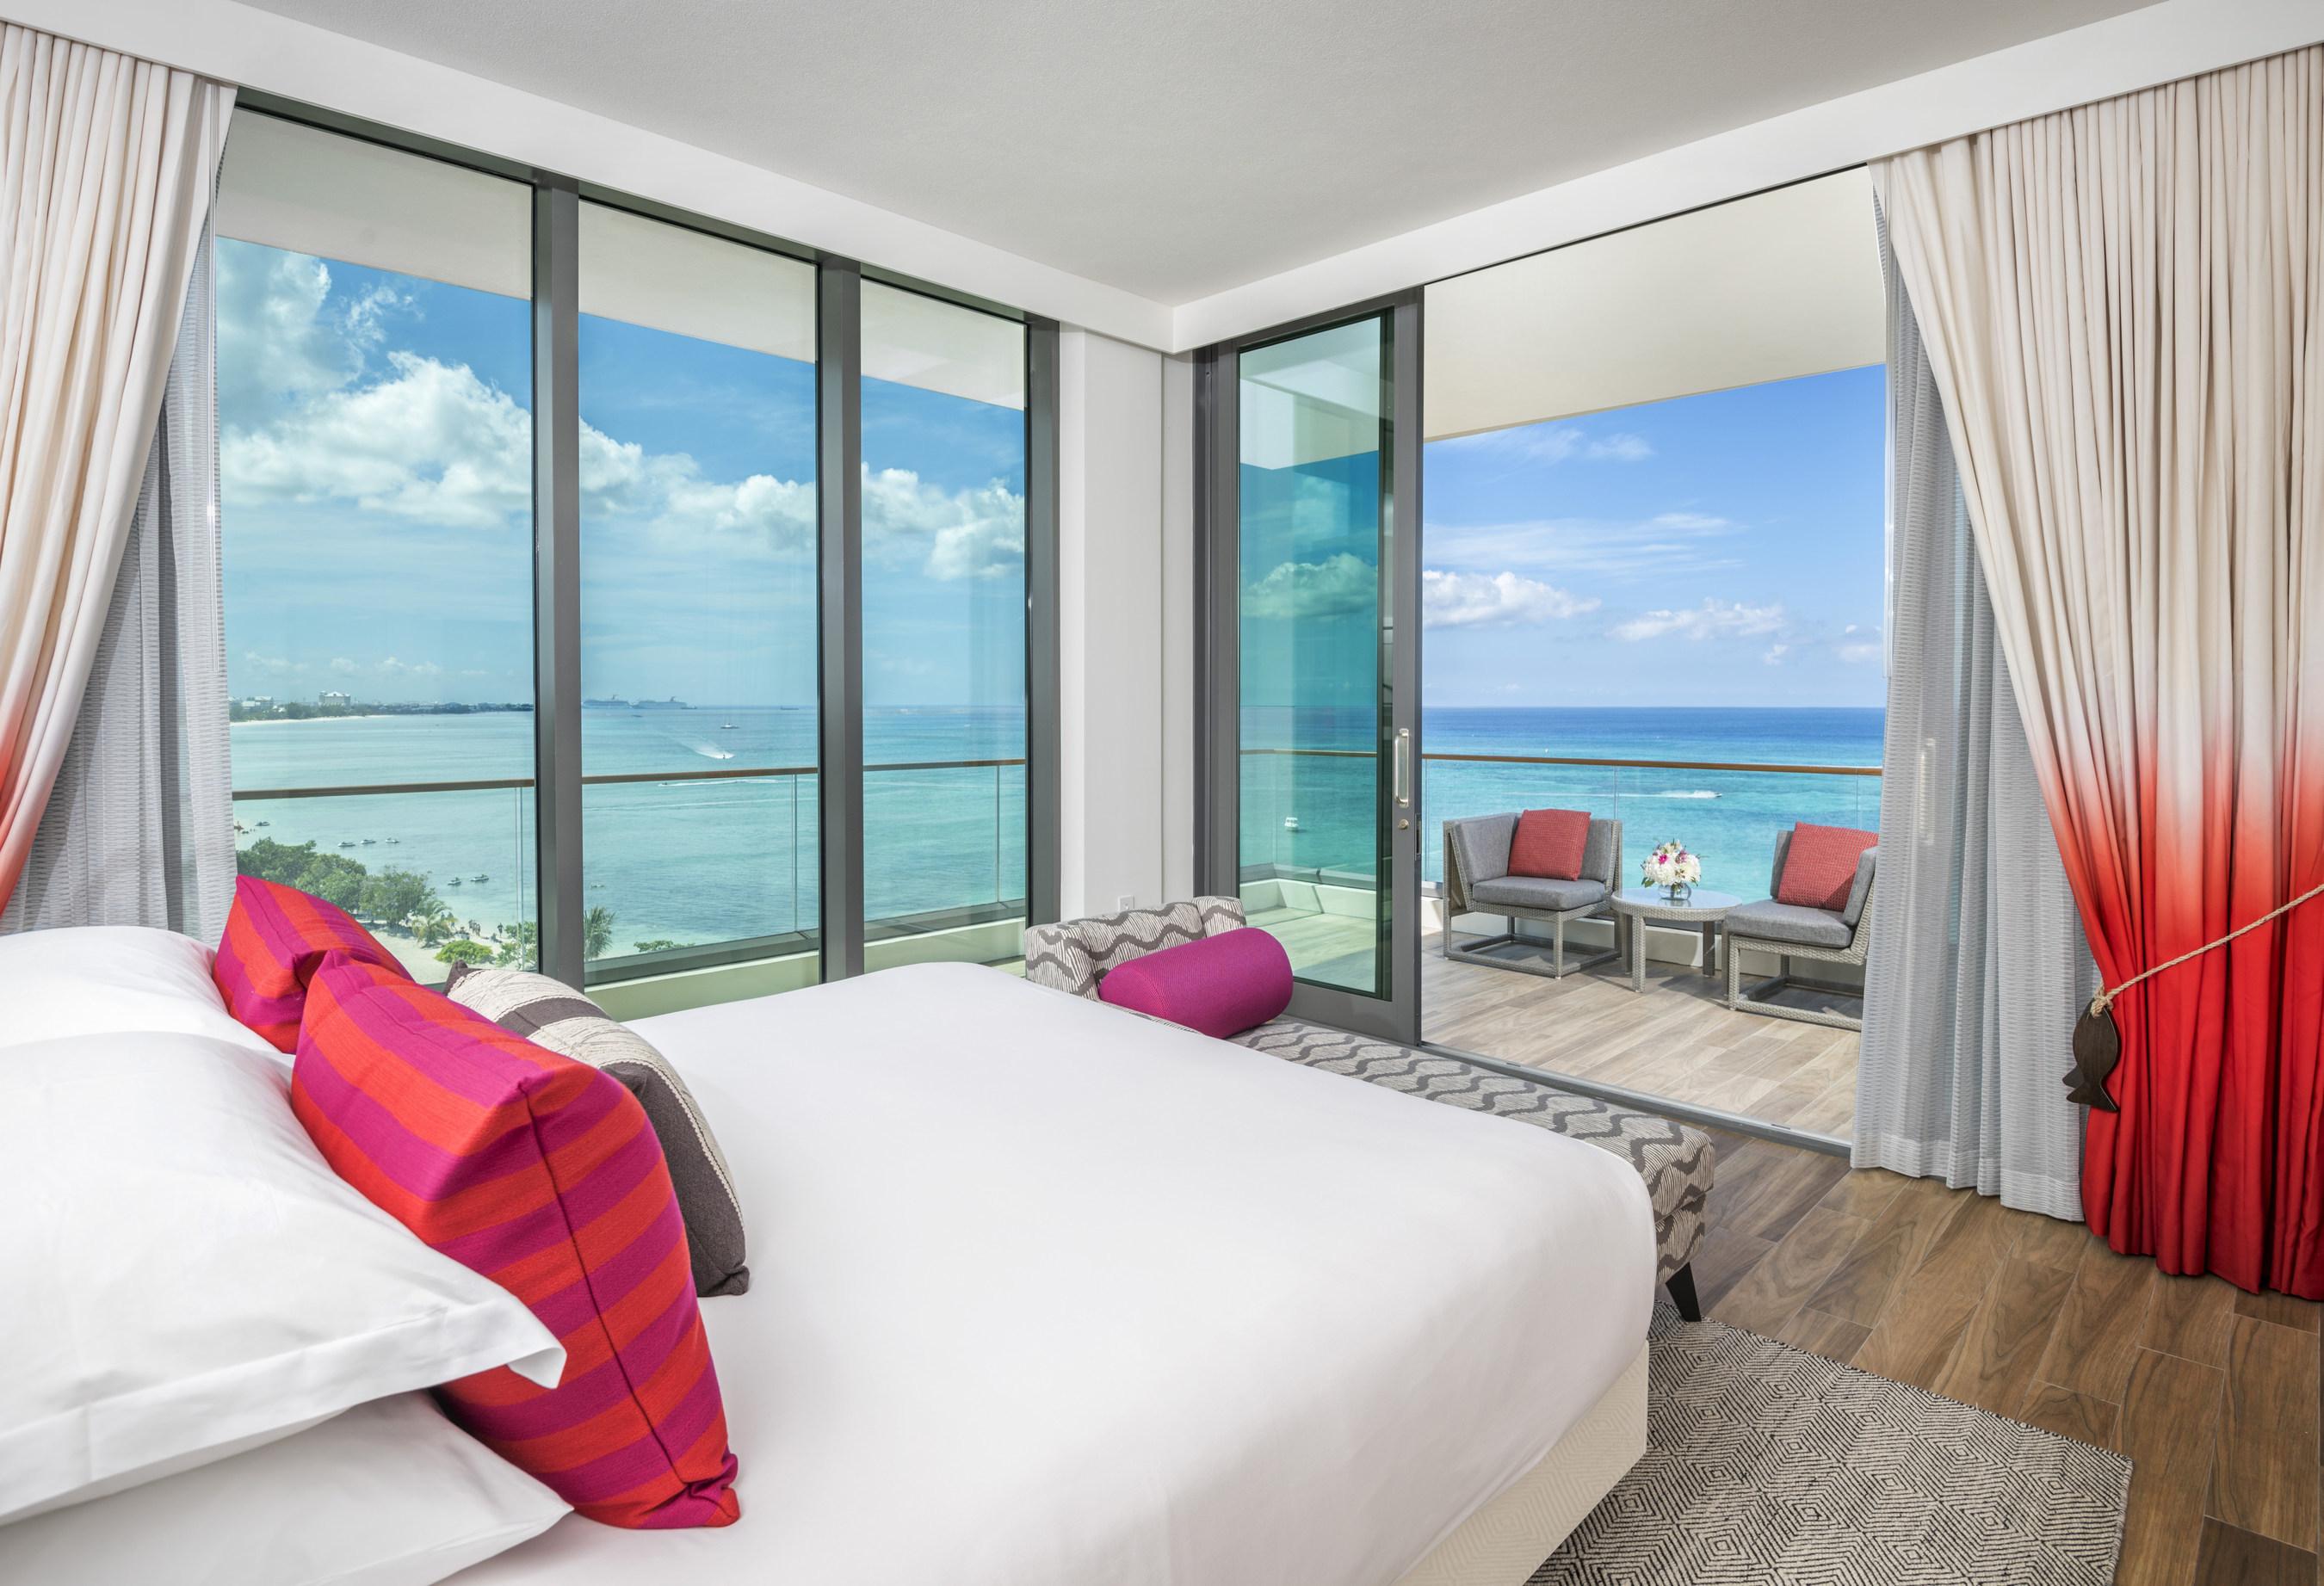 One-bedroom oceanfront king suite, Courtesy of Kimpton Seafire Resort + Spa